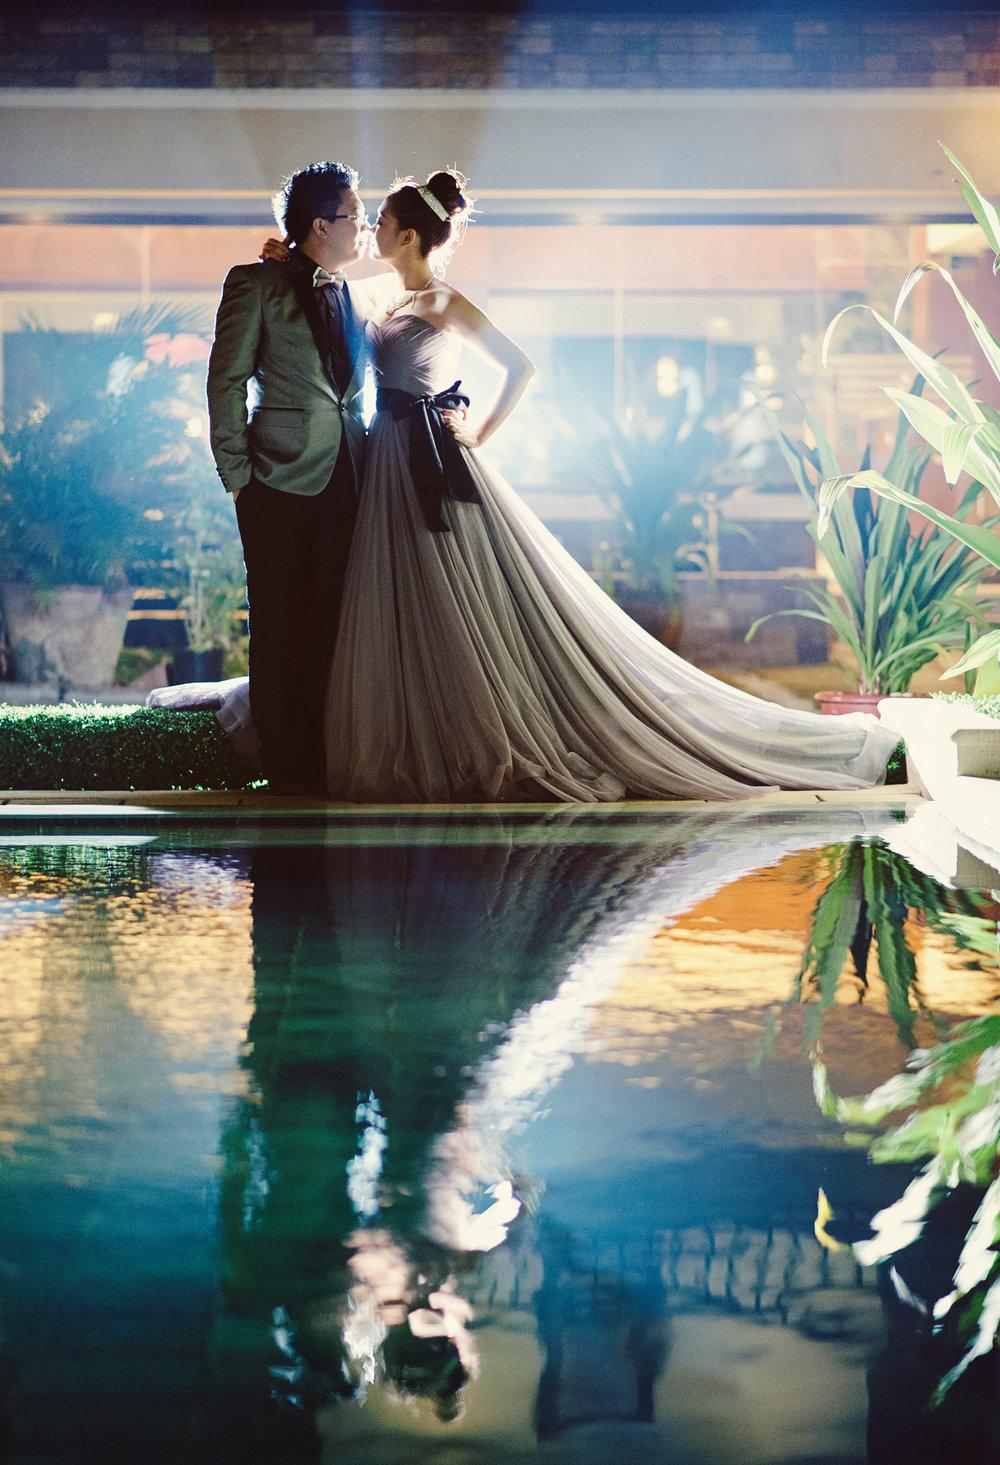 Chris_Hui_婚禮_婚紗照_pre_wedding_photography_best_138_.jpg